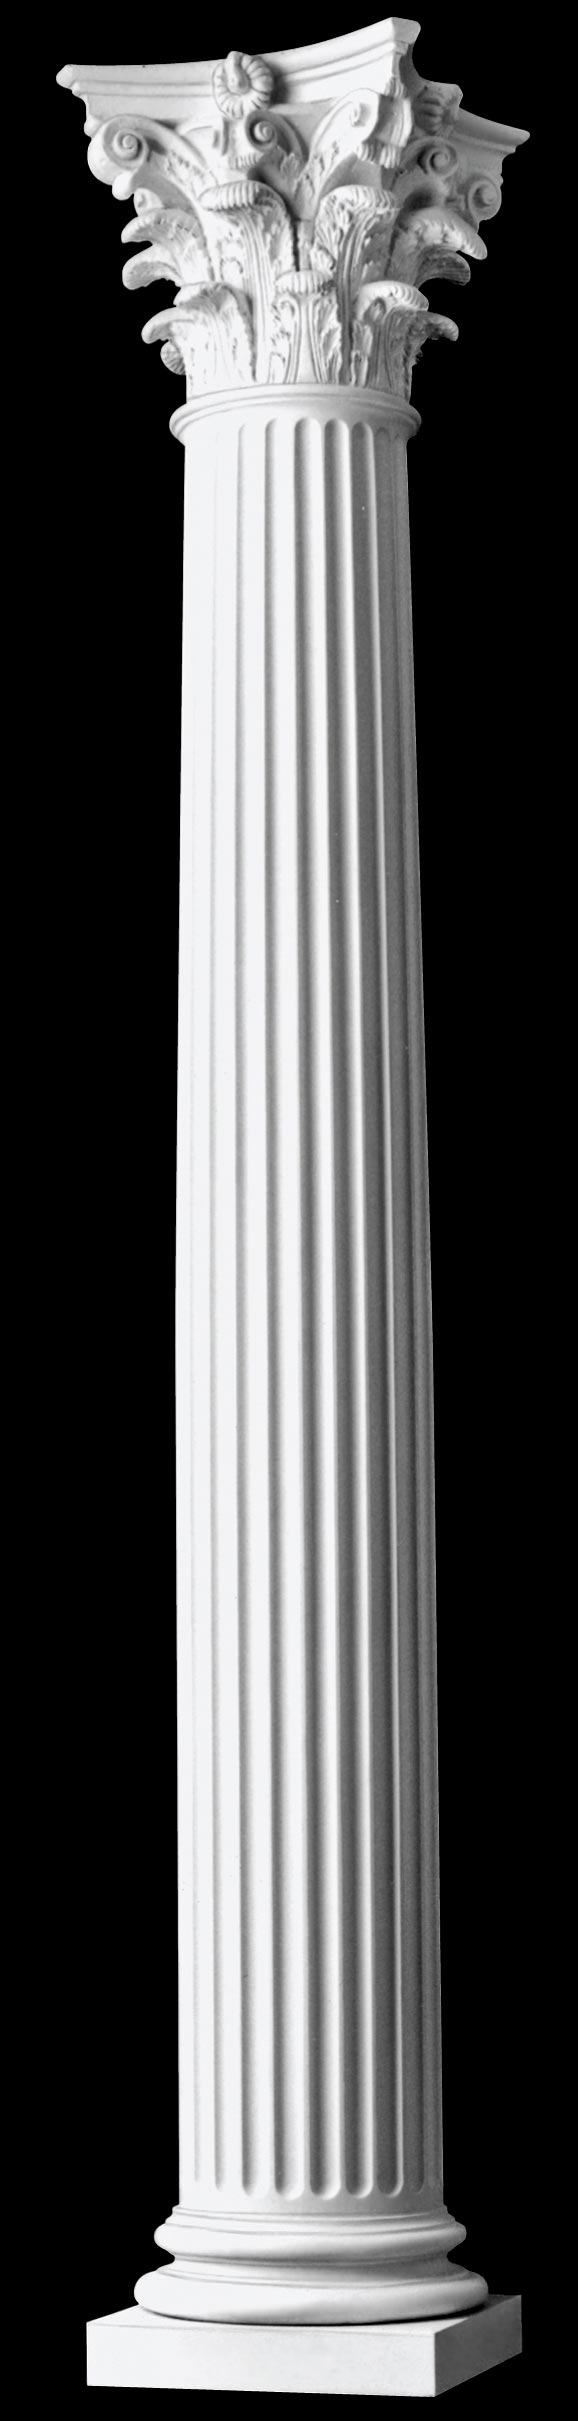 Architectural columns fluted roman corinthian wood columns for Architectural wood columns